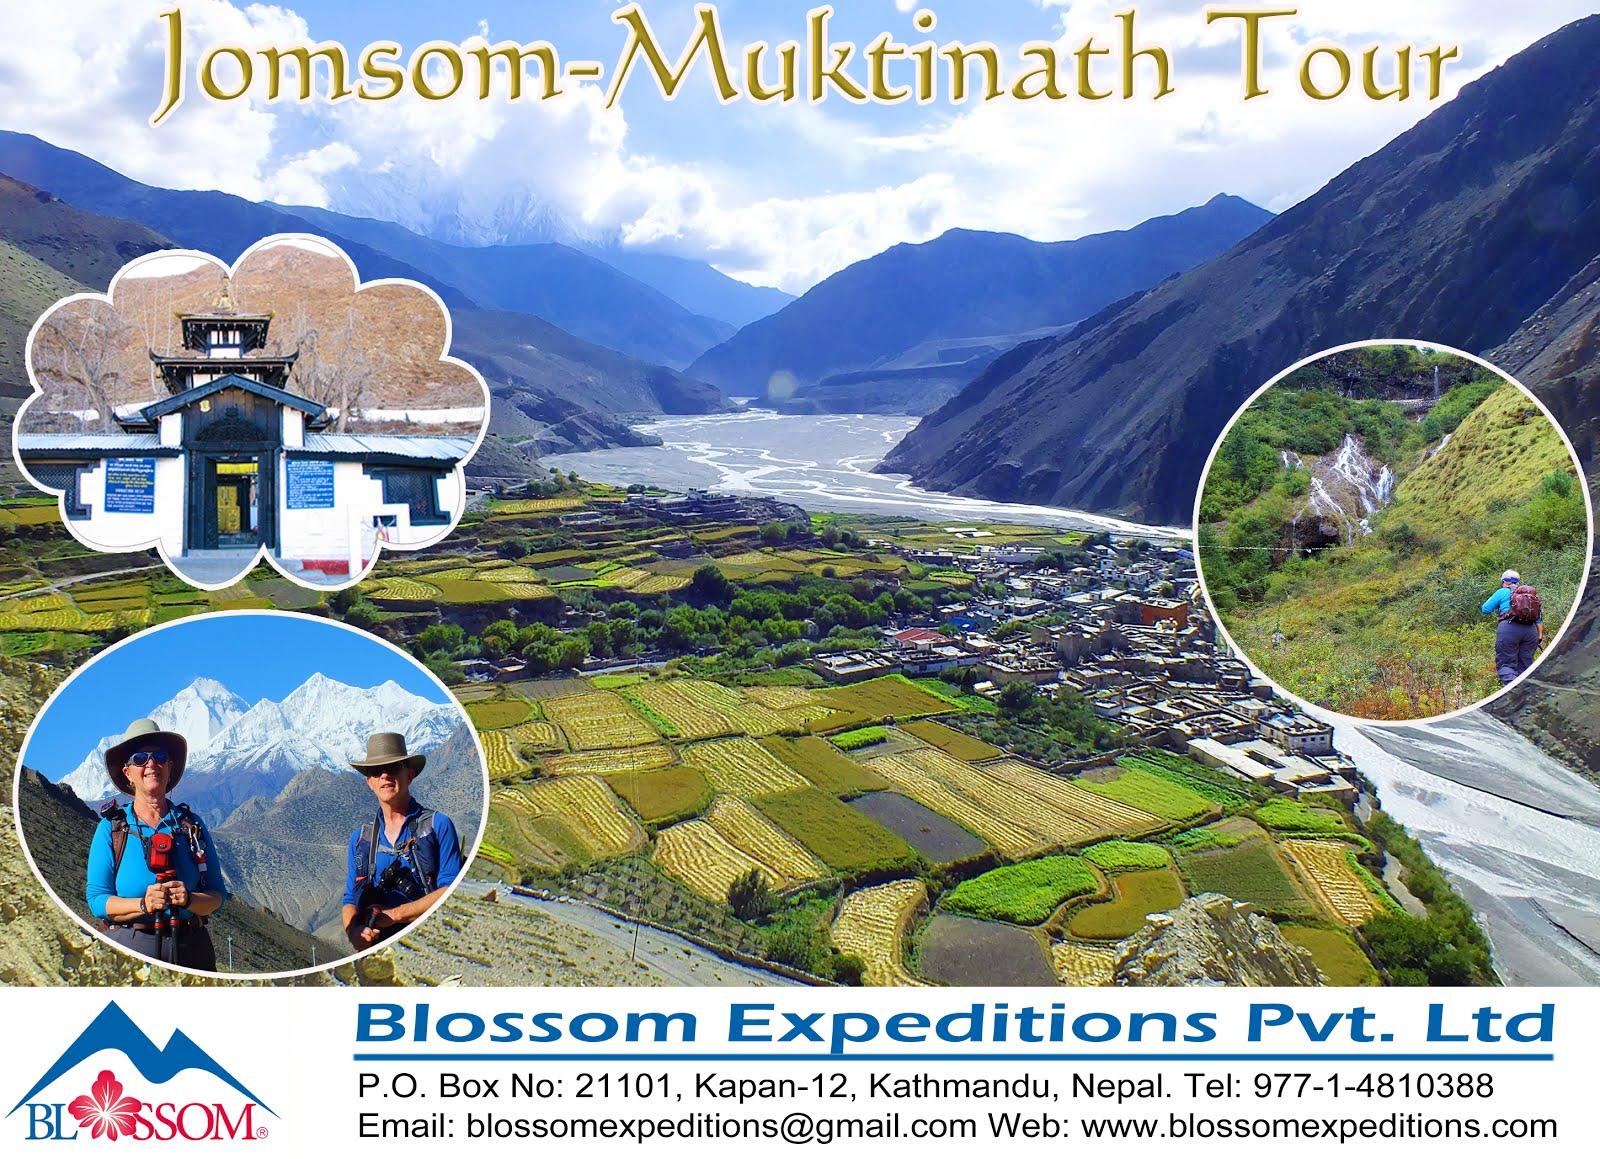 Jomsom-Muktinath Tour